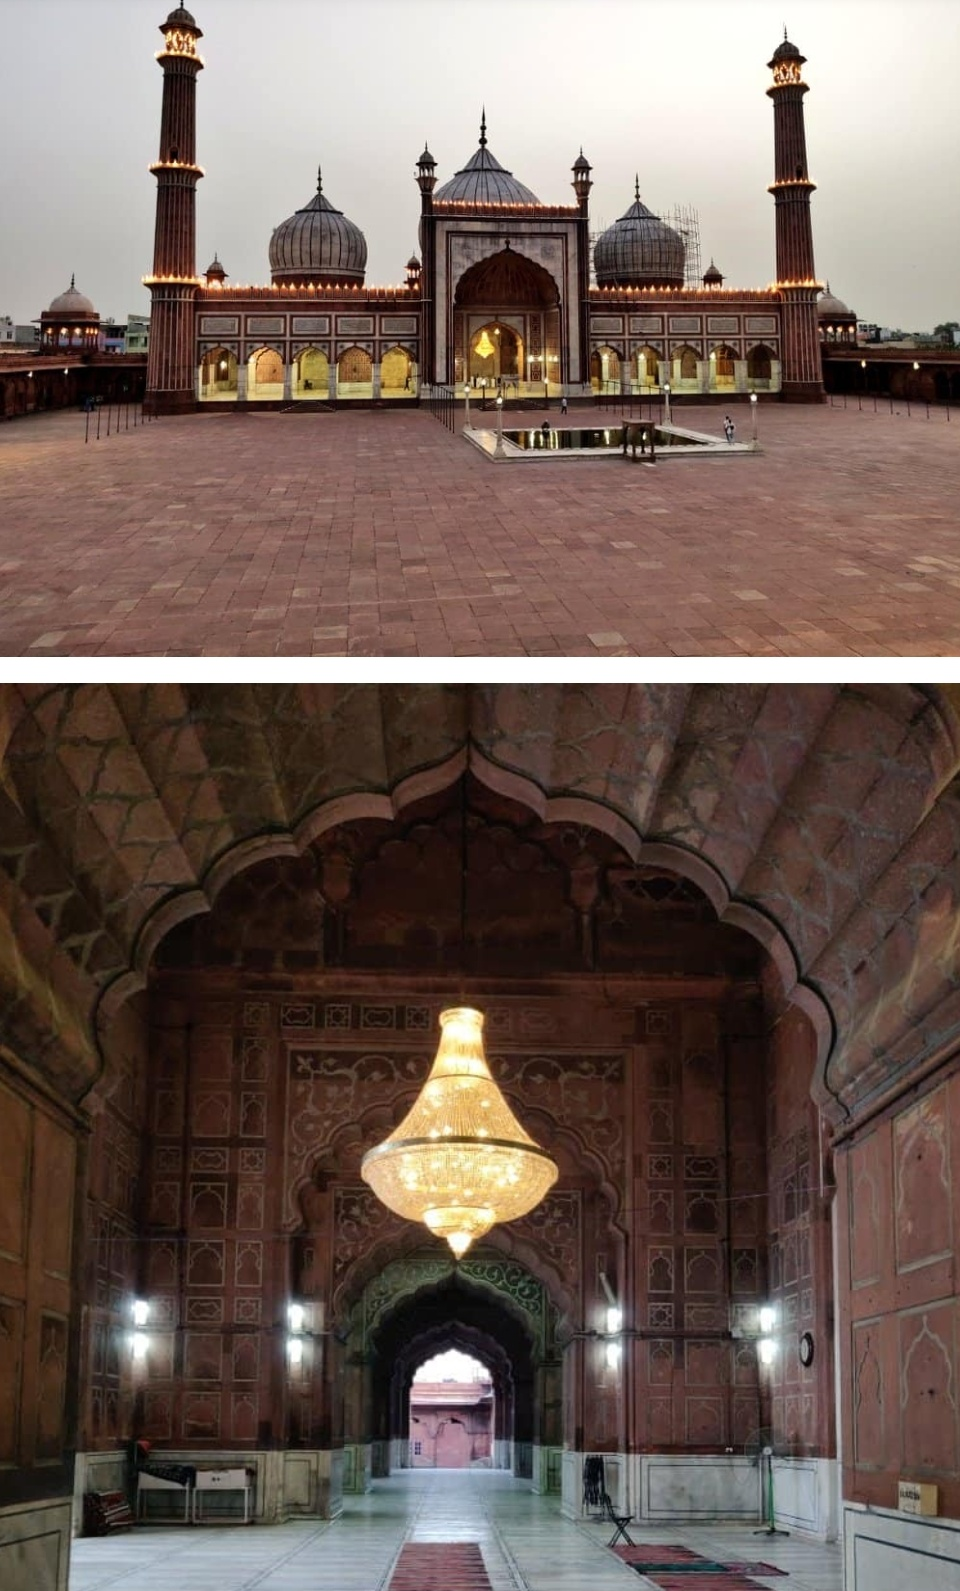 ईद-उल-फितर के दिन ऐतिहासिक जामा मस्जिद रही बंद! 1